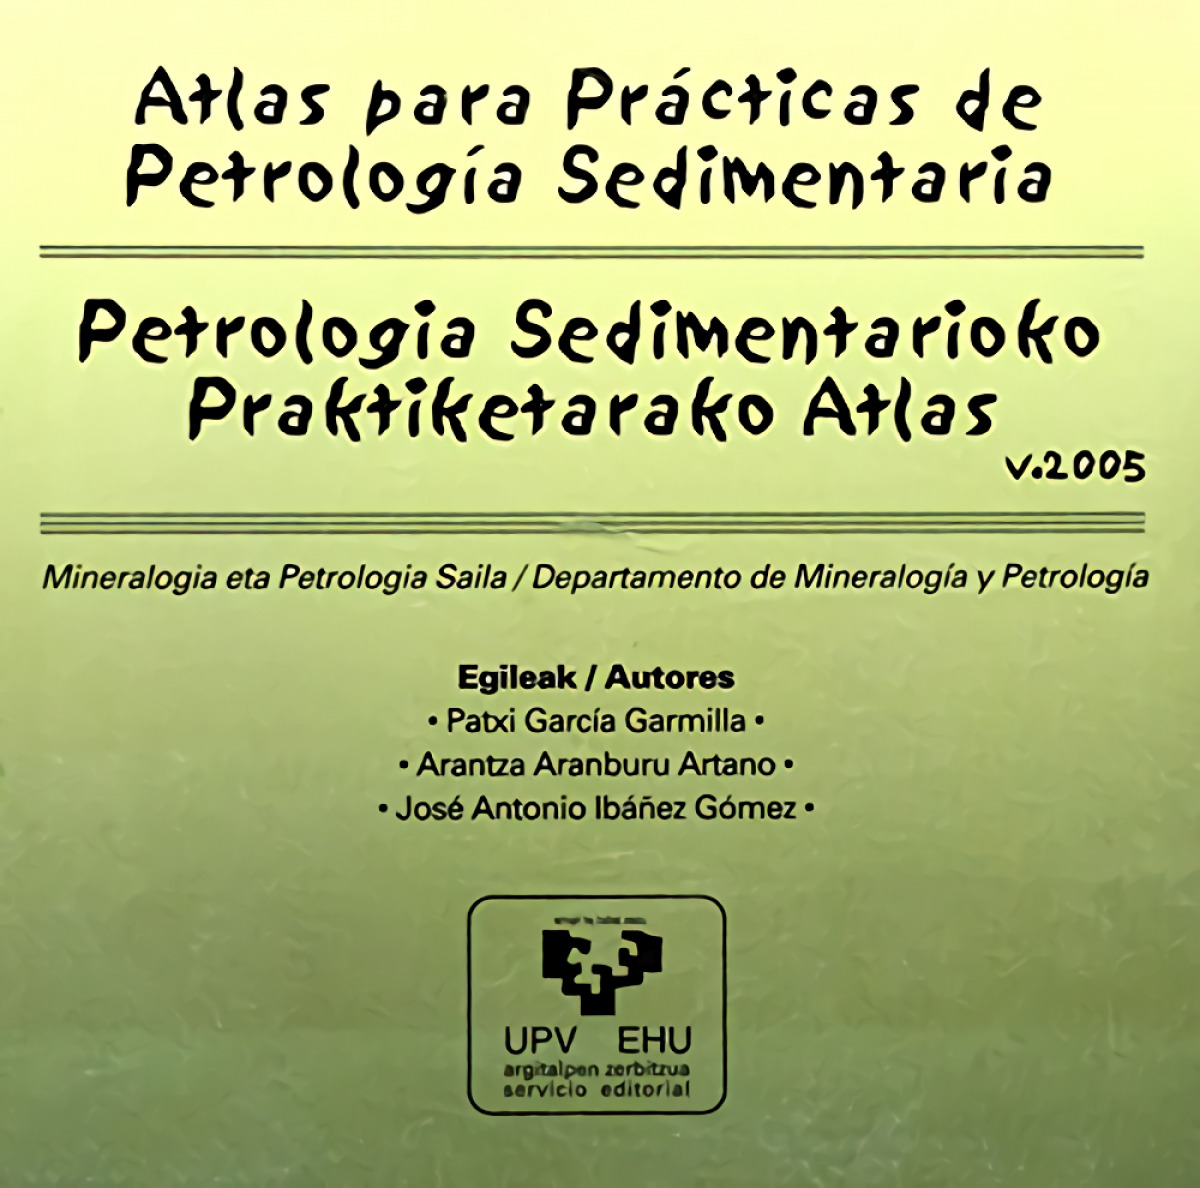 Atlas para prácticas de petrología sedimentaria - Petrologia sedimentarioko prak - García Garmilla, Patxi / Aranburu Artano, Arantza / Ibáñez Gómez, José Antonio